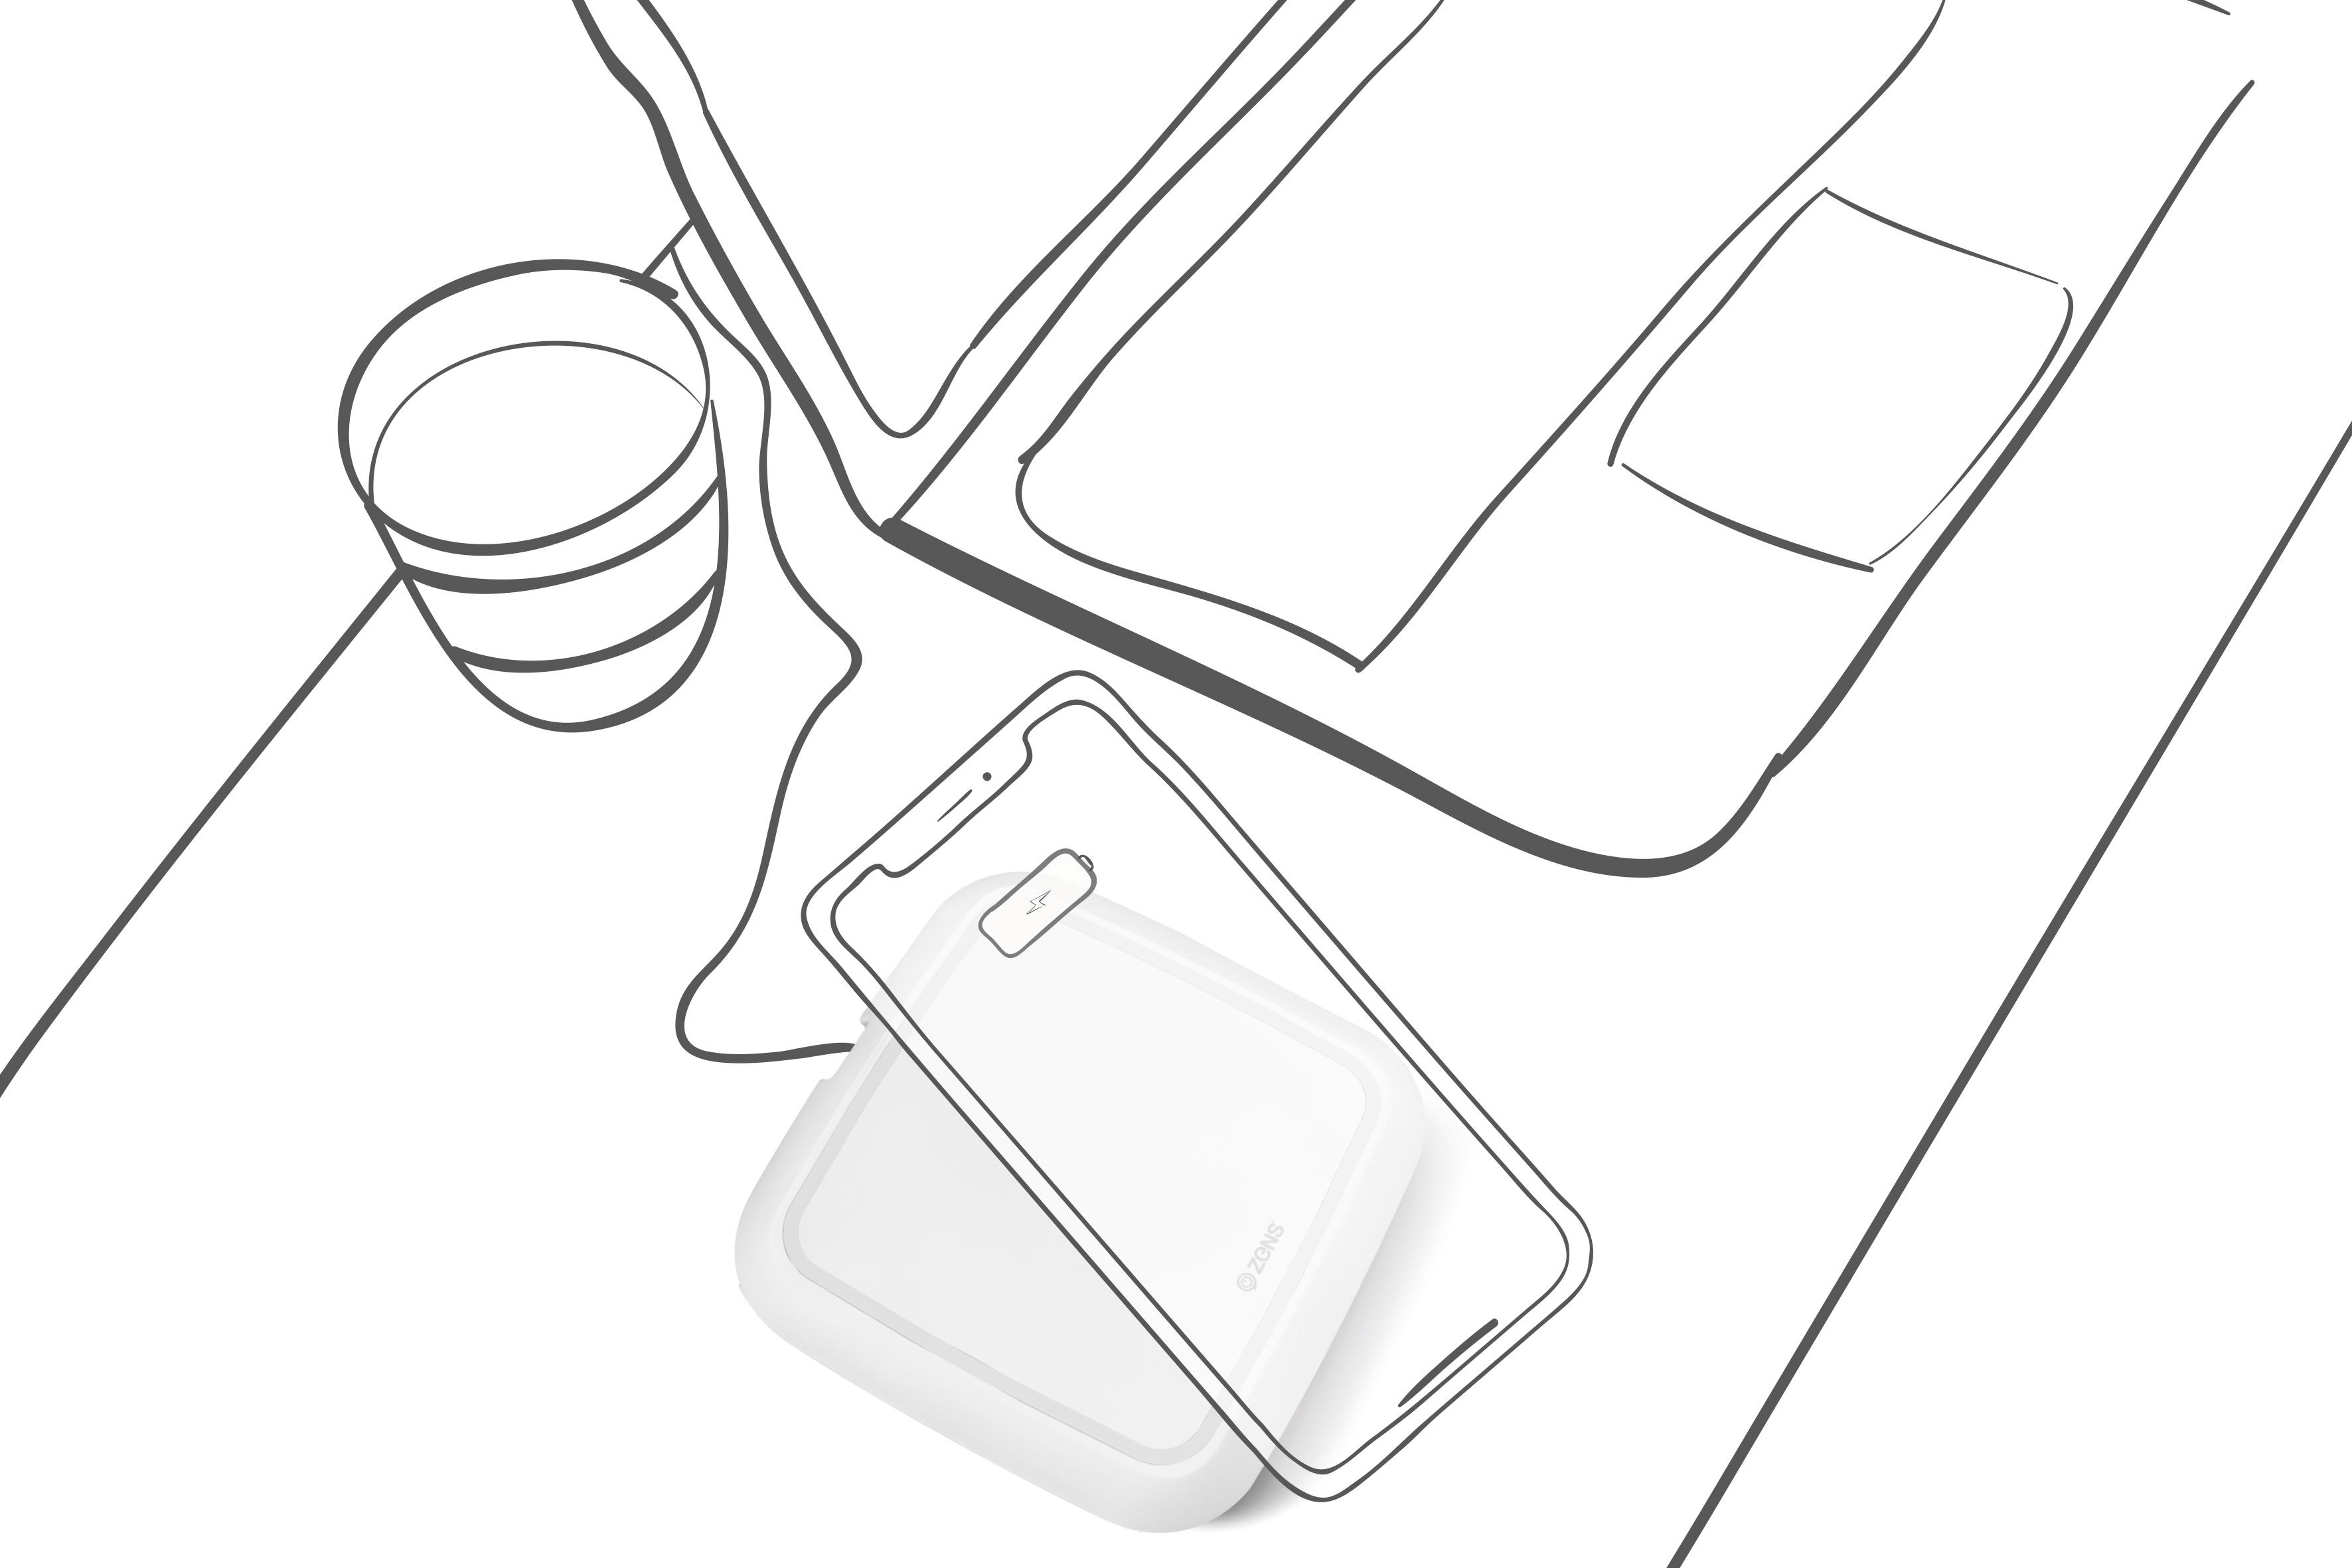 3543x2362 Zens Single Fast Wireless Charger 10w White